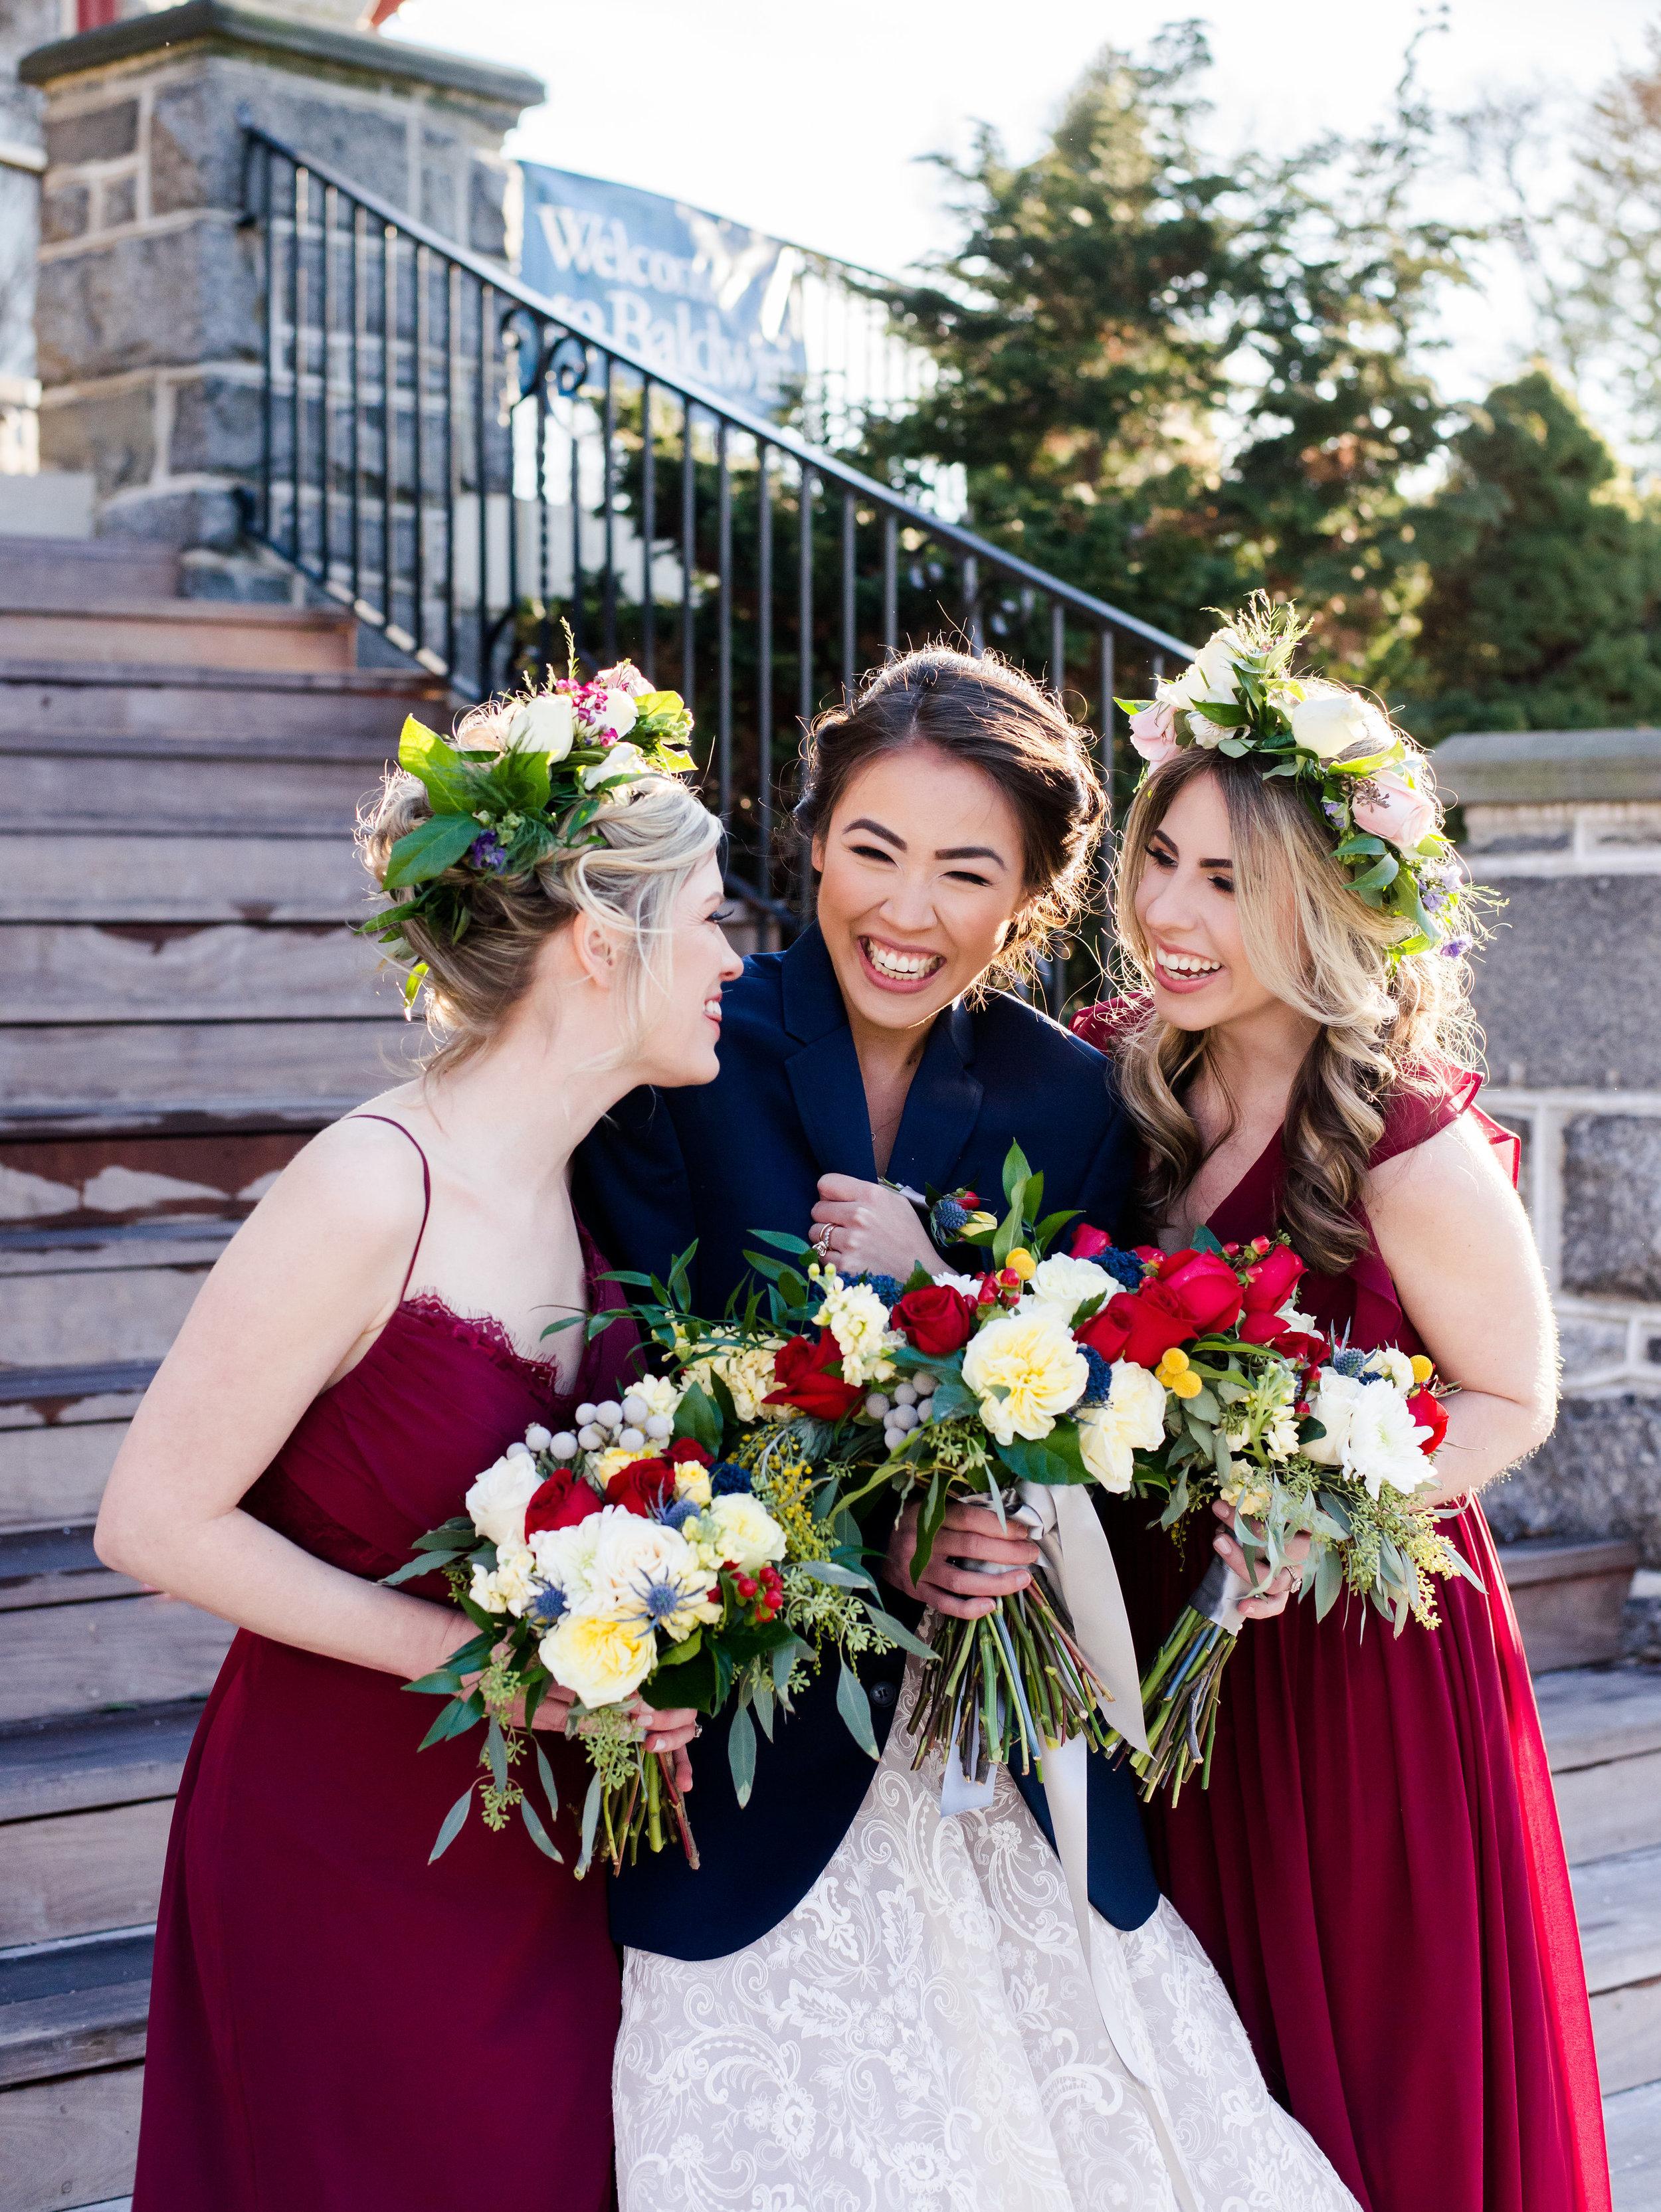 Baldwin-School-Wedding-Photographer-Event-Venue-Pennsylvania-Mainline-Andrea-Krout-Photography-511.jpg